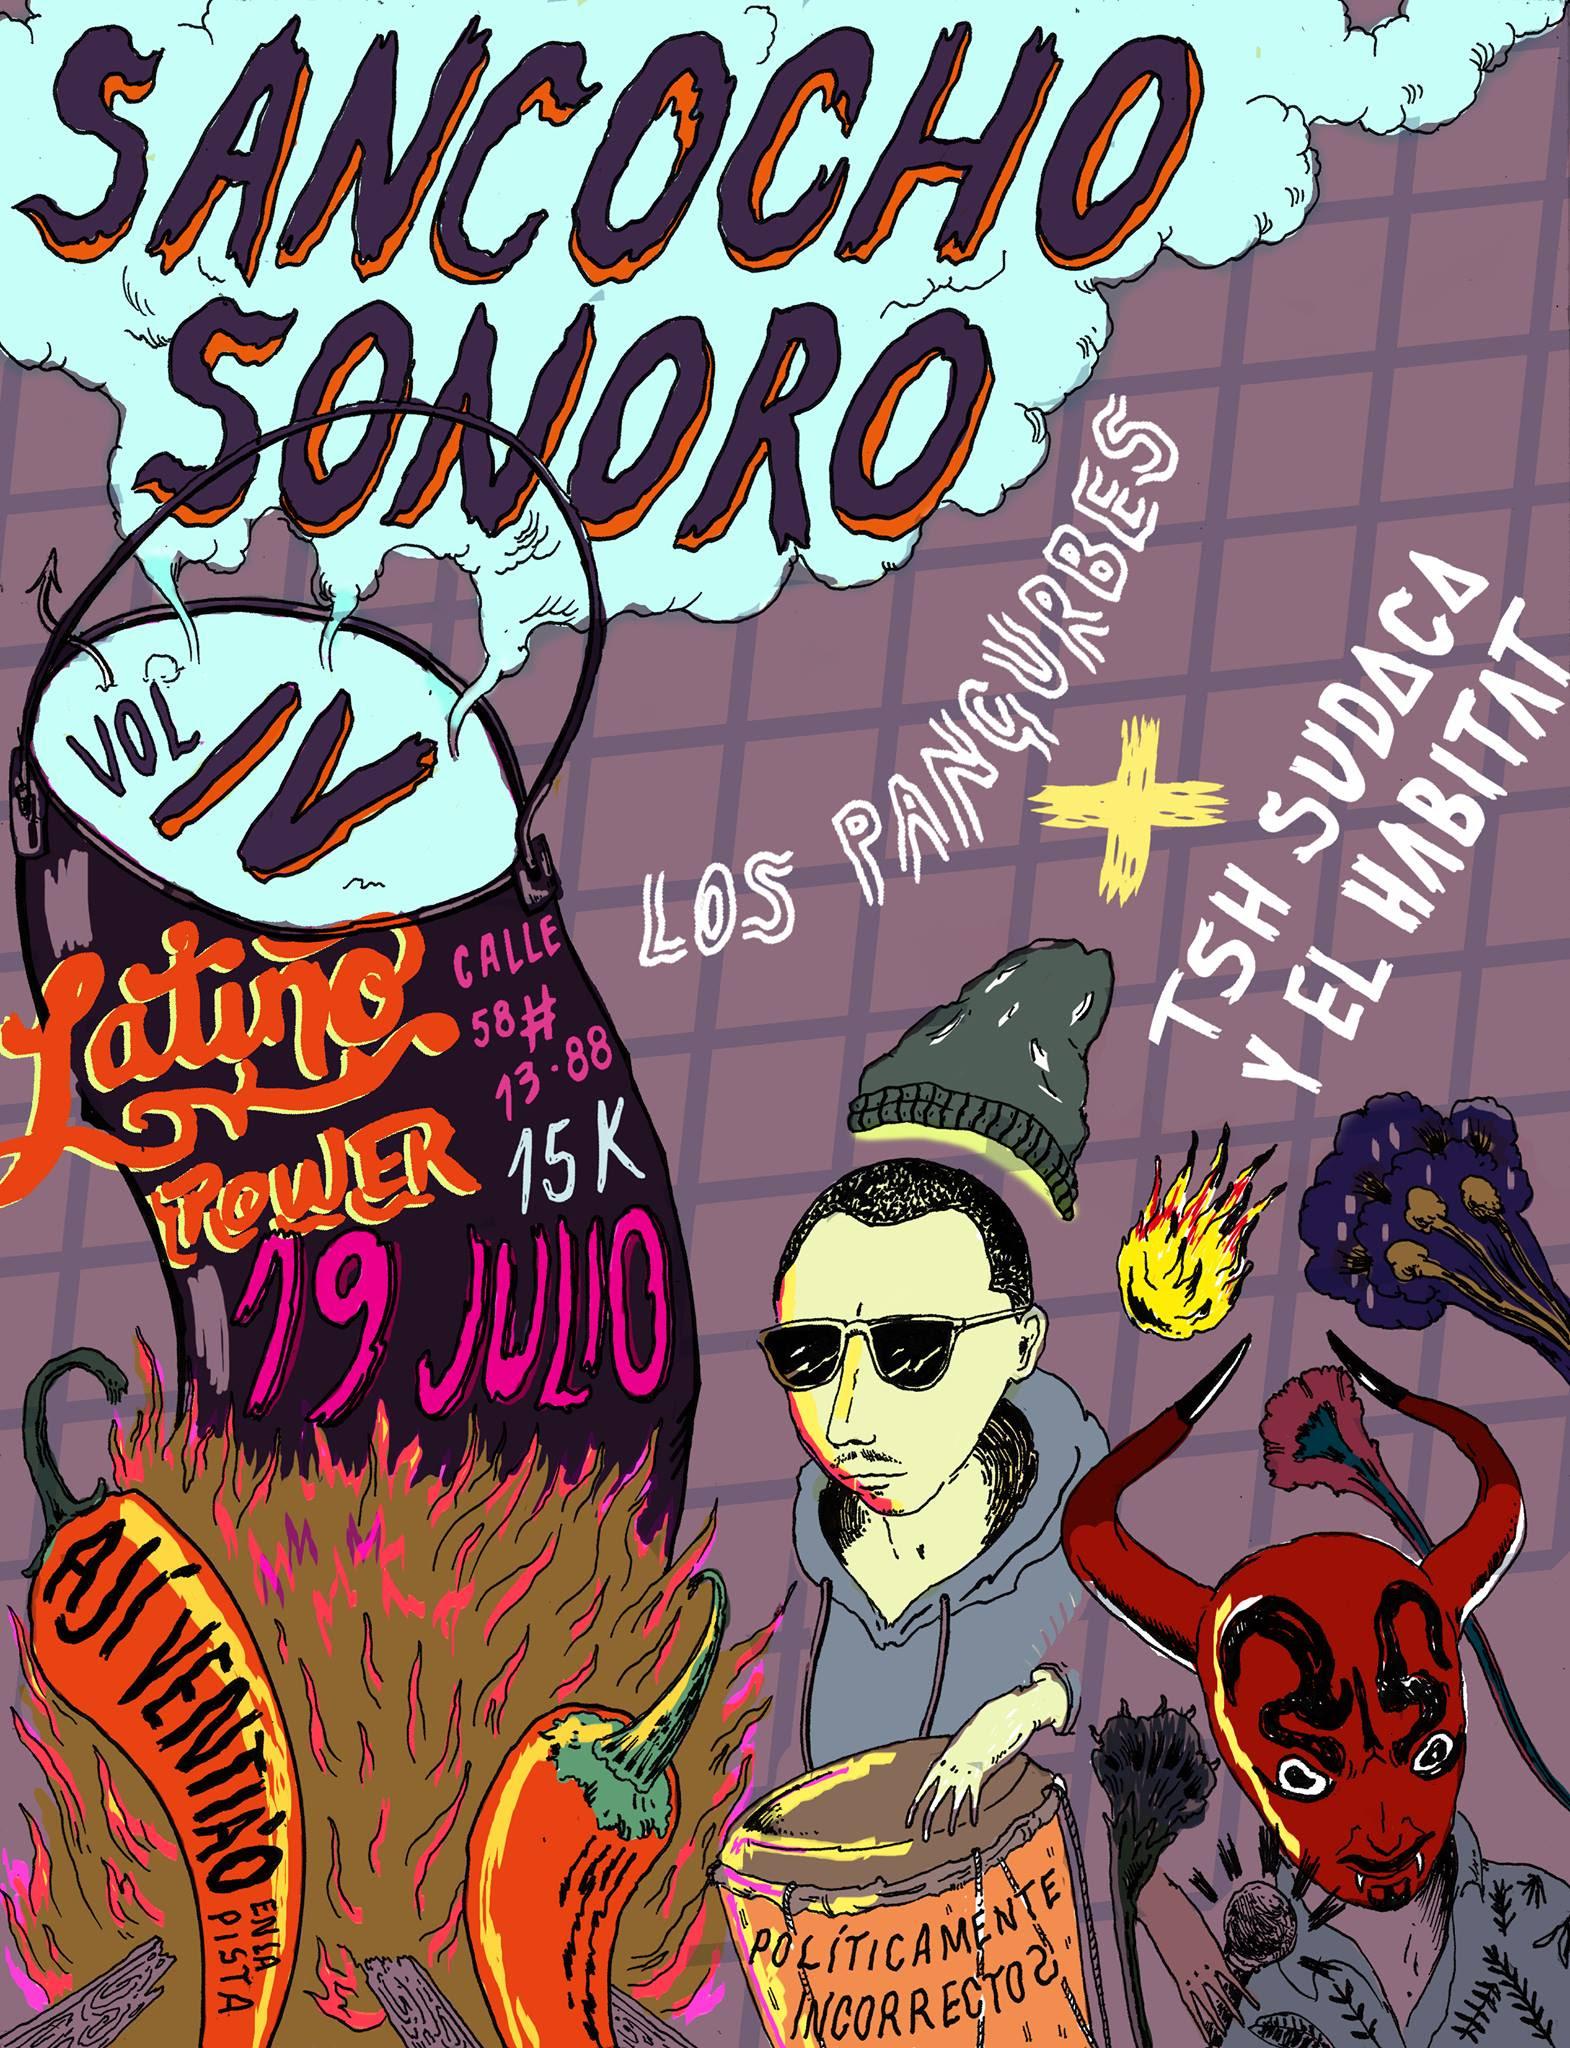 Sancocho Sonoro Vol IV - unnamed-1